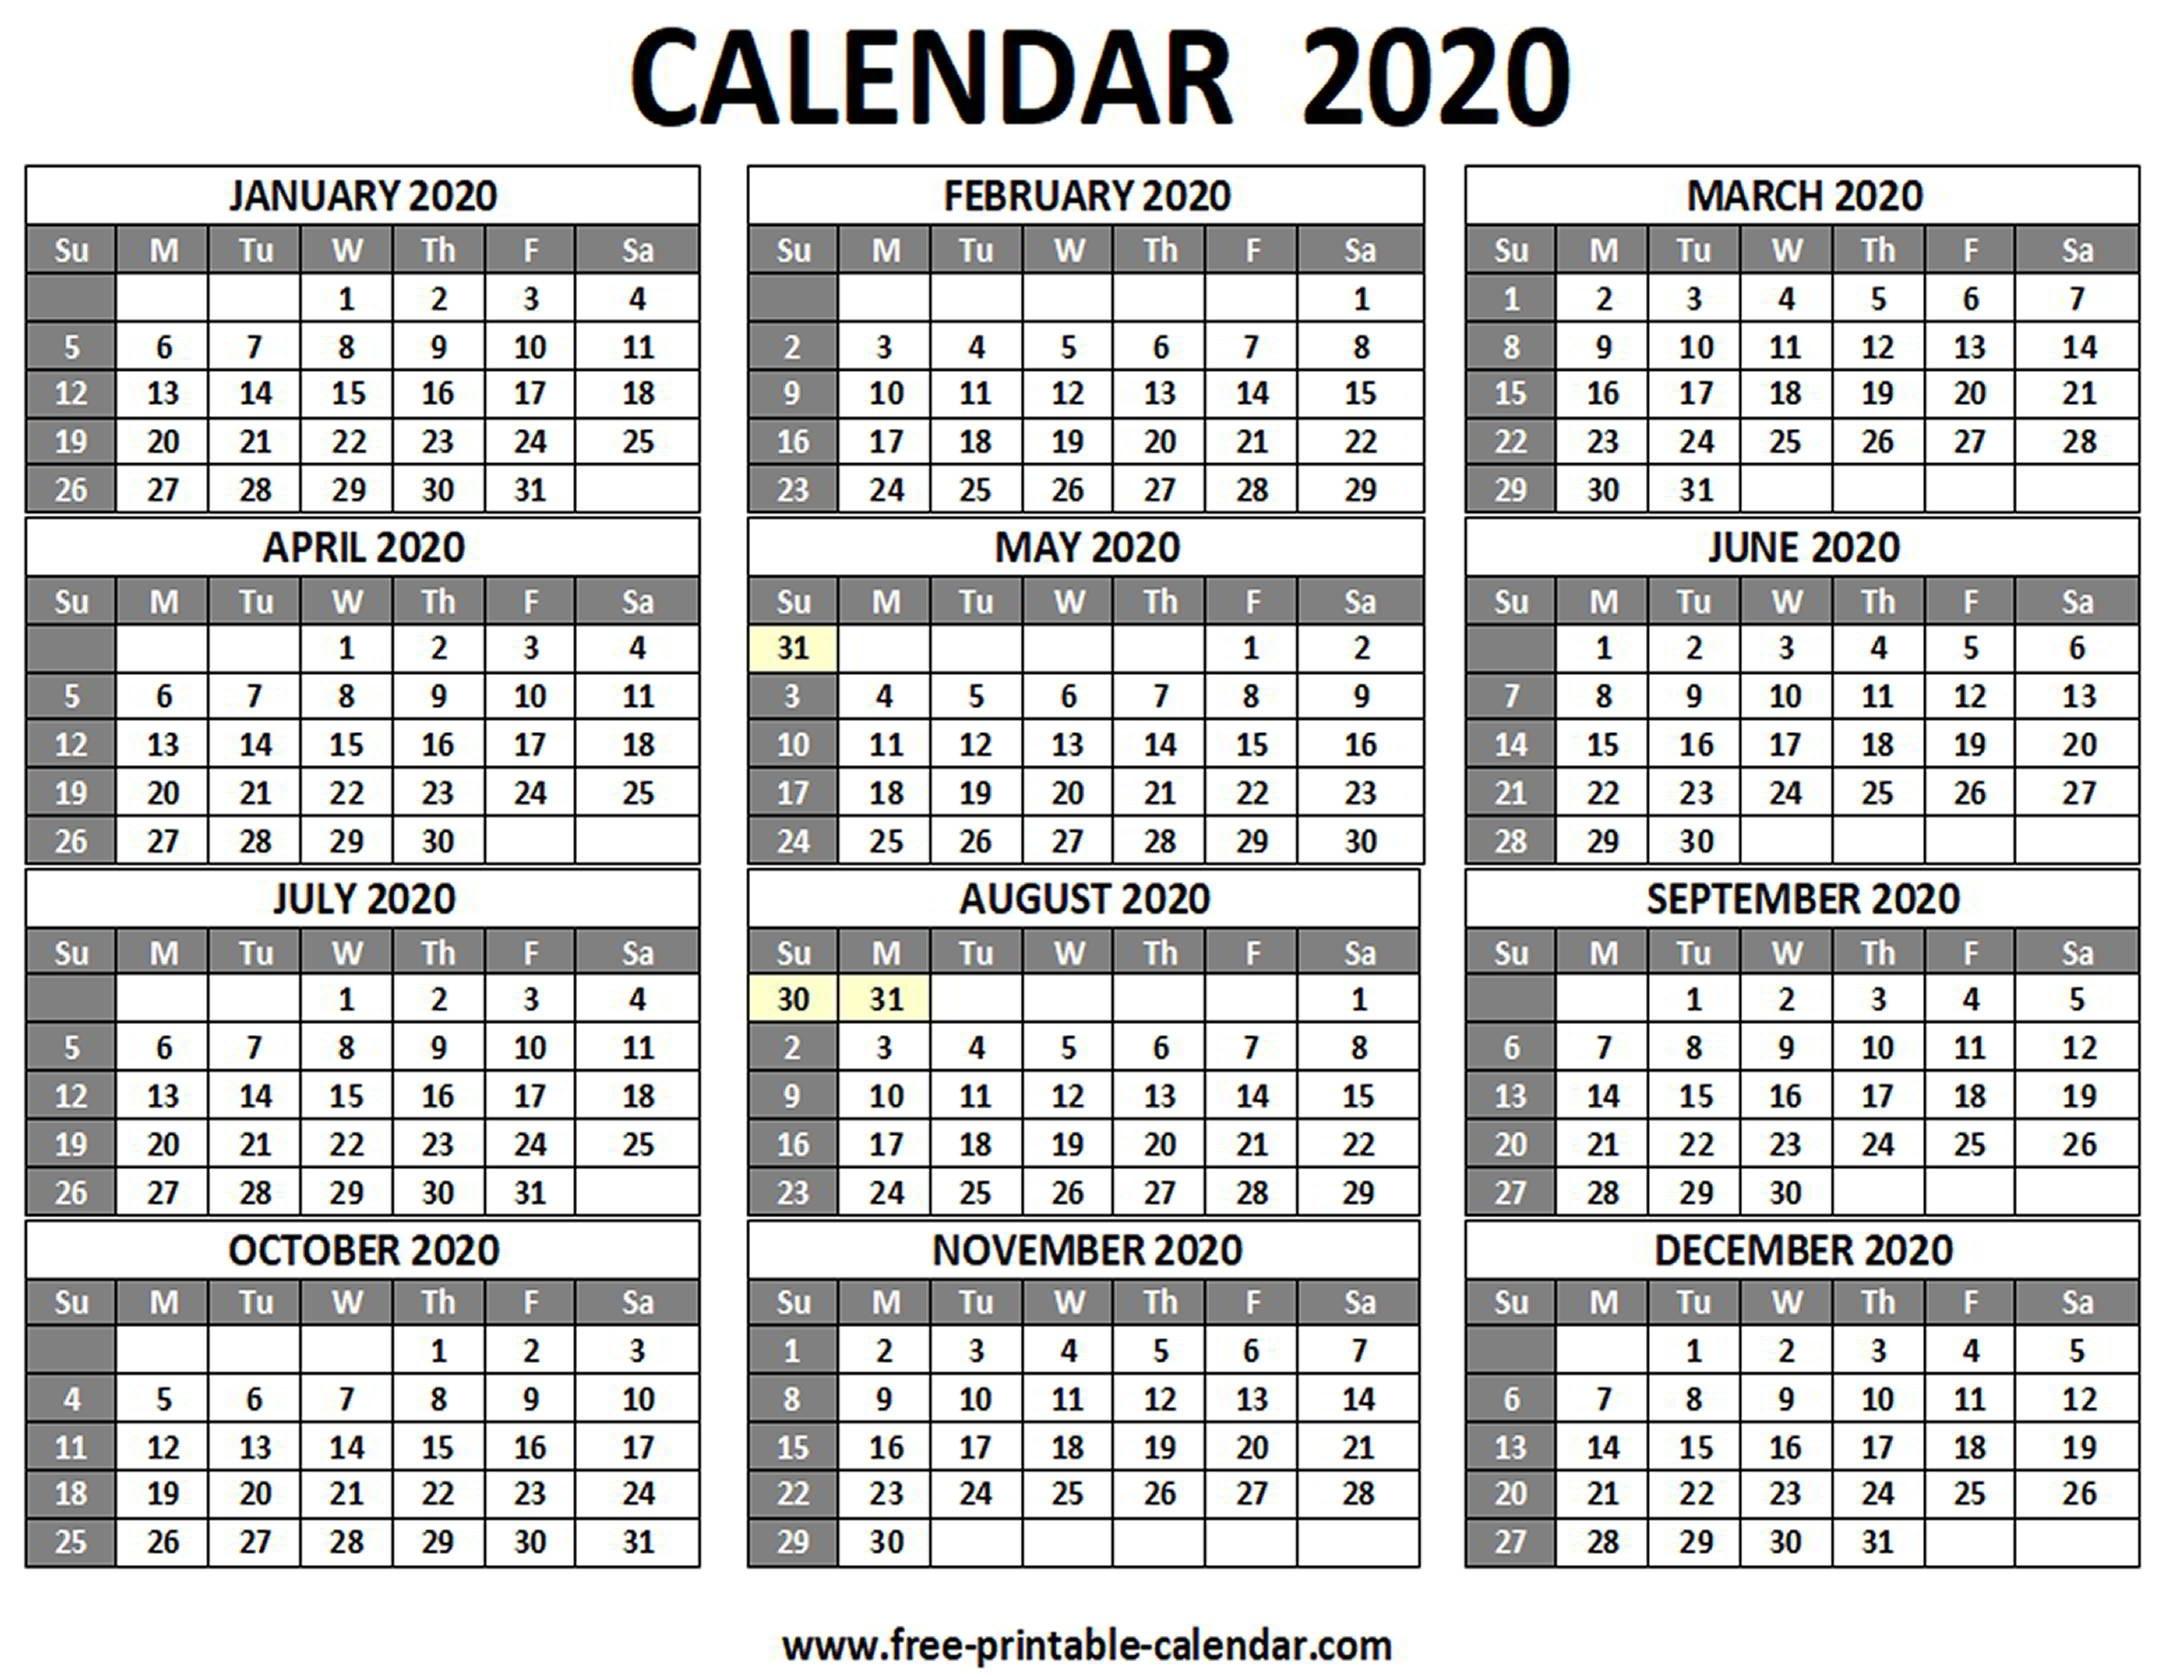 Printable 2020 Calendar - Free-Printable-Calendar  Free Printable Calendar 12 Months